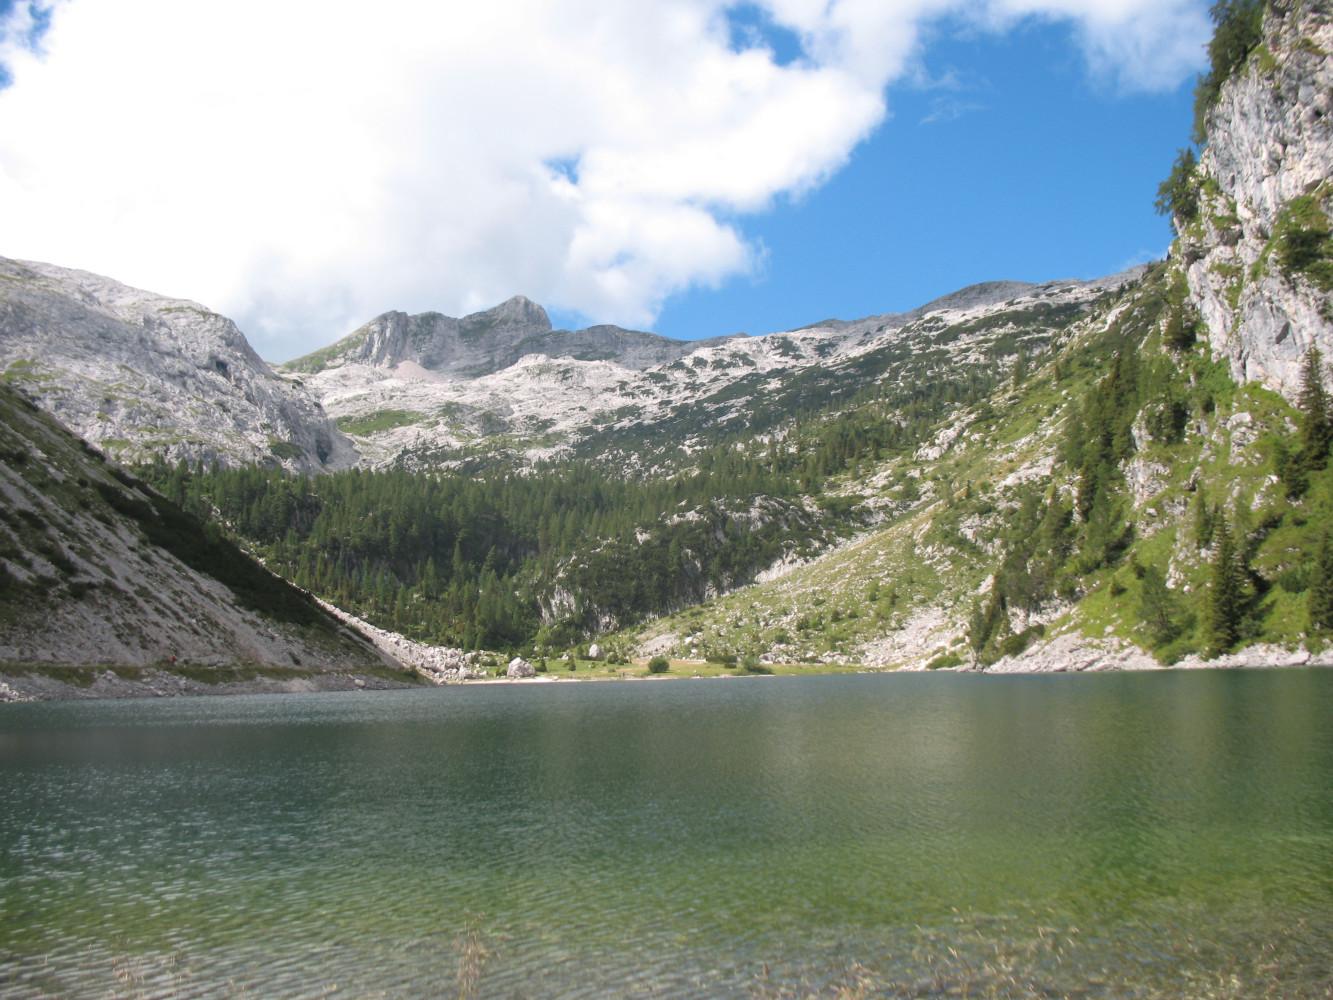 Krnska jezera